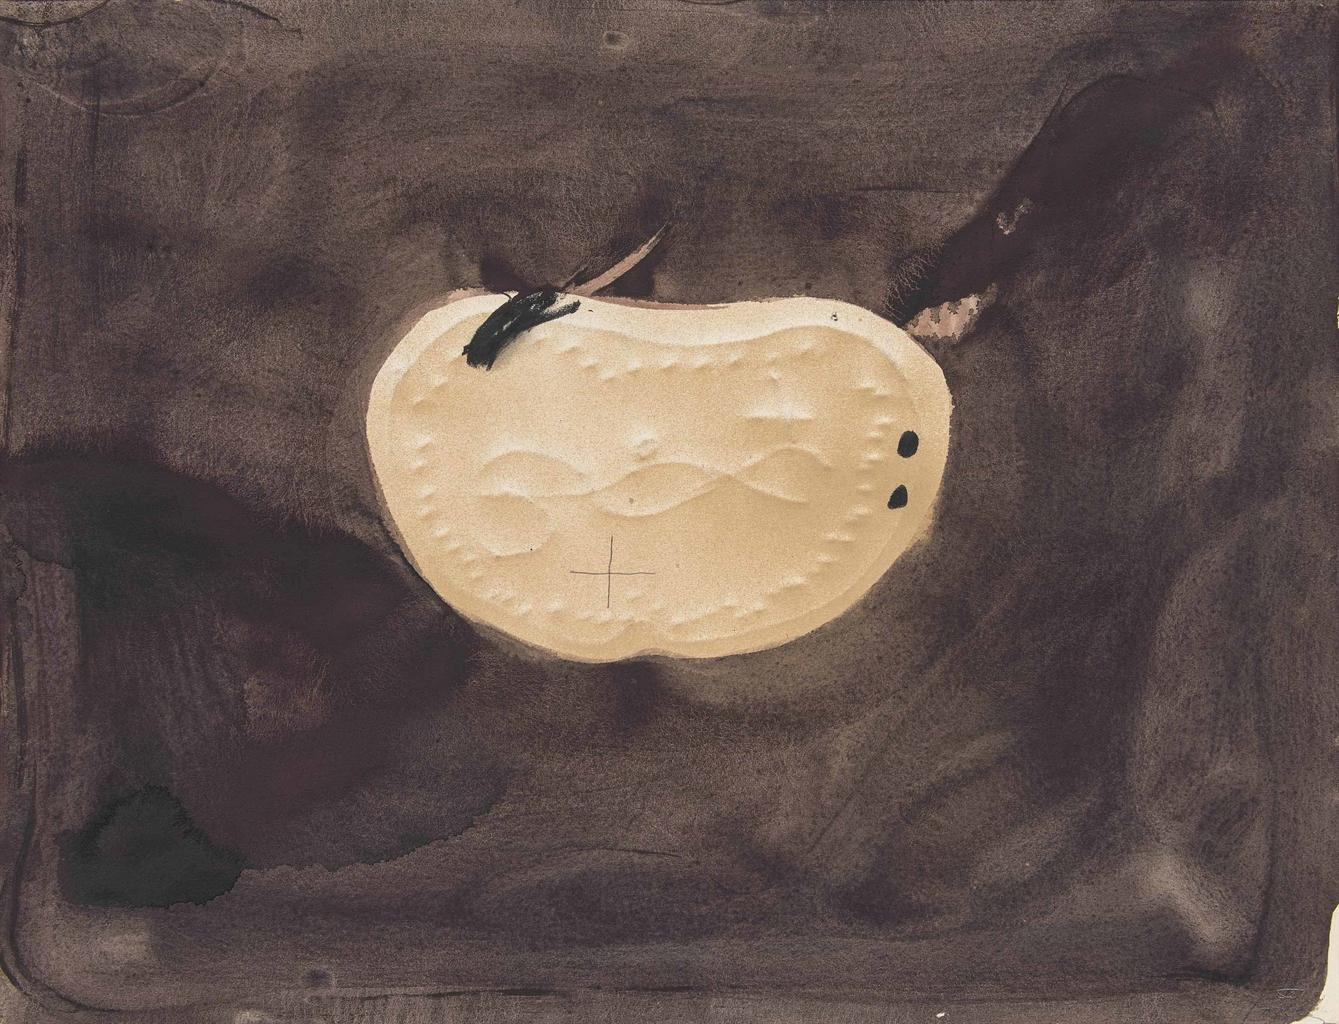 Antoni Tapies-El Pectoral (The Pectoral)-